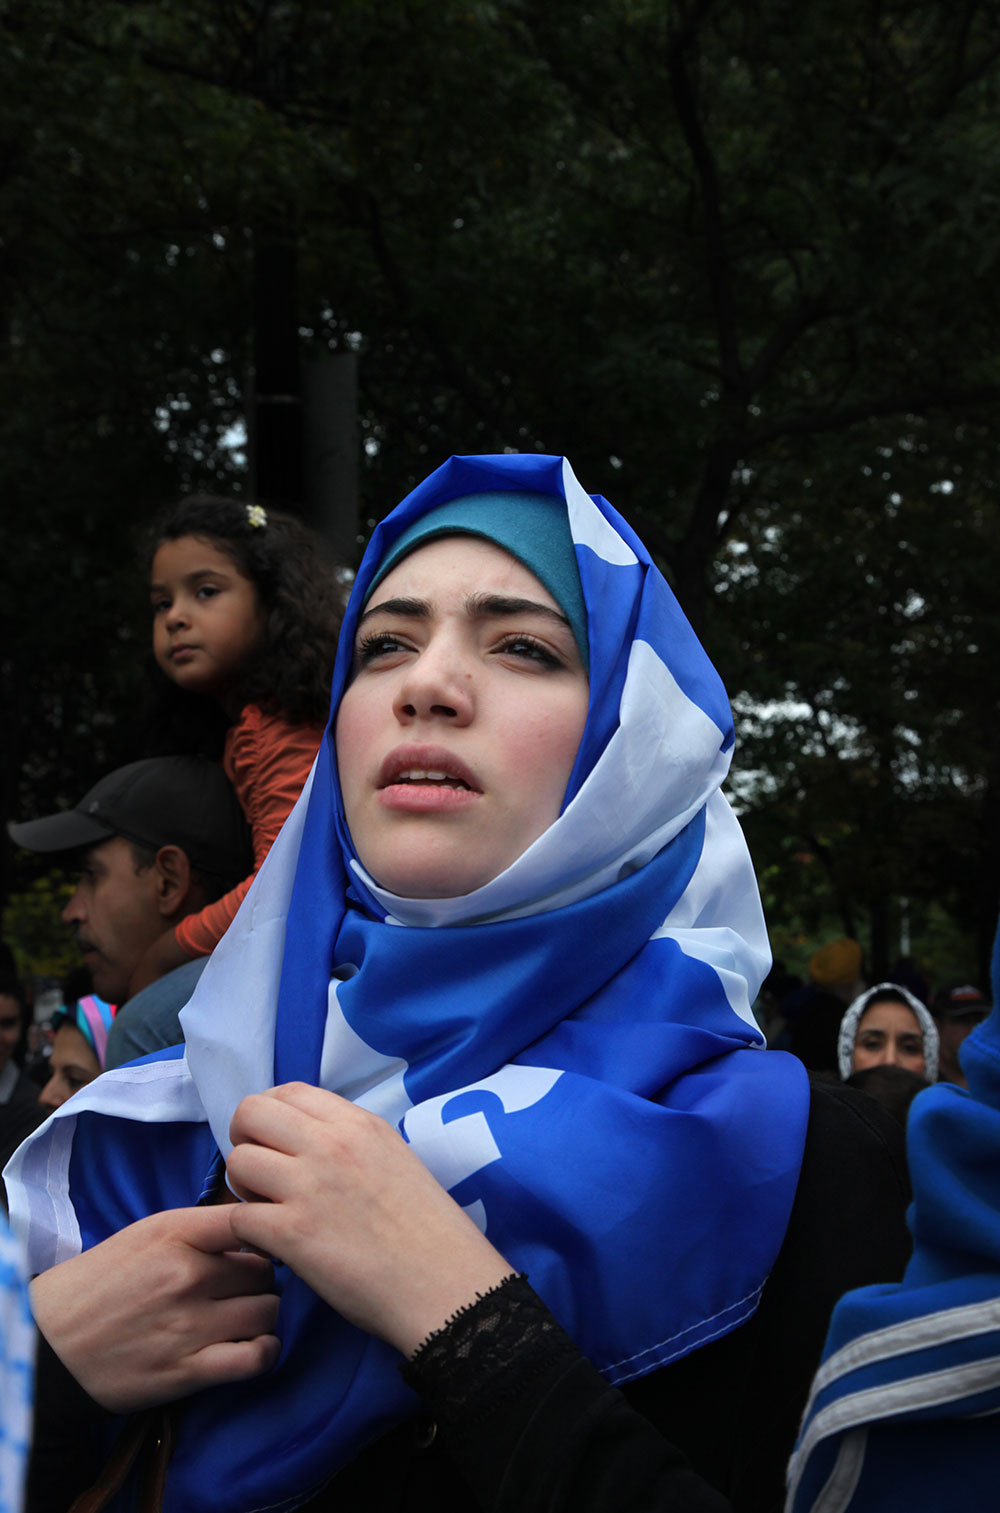 rencontre mariage musulman montreal